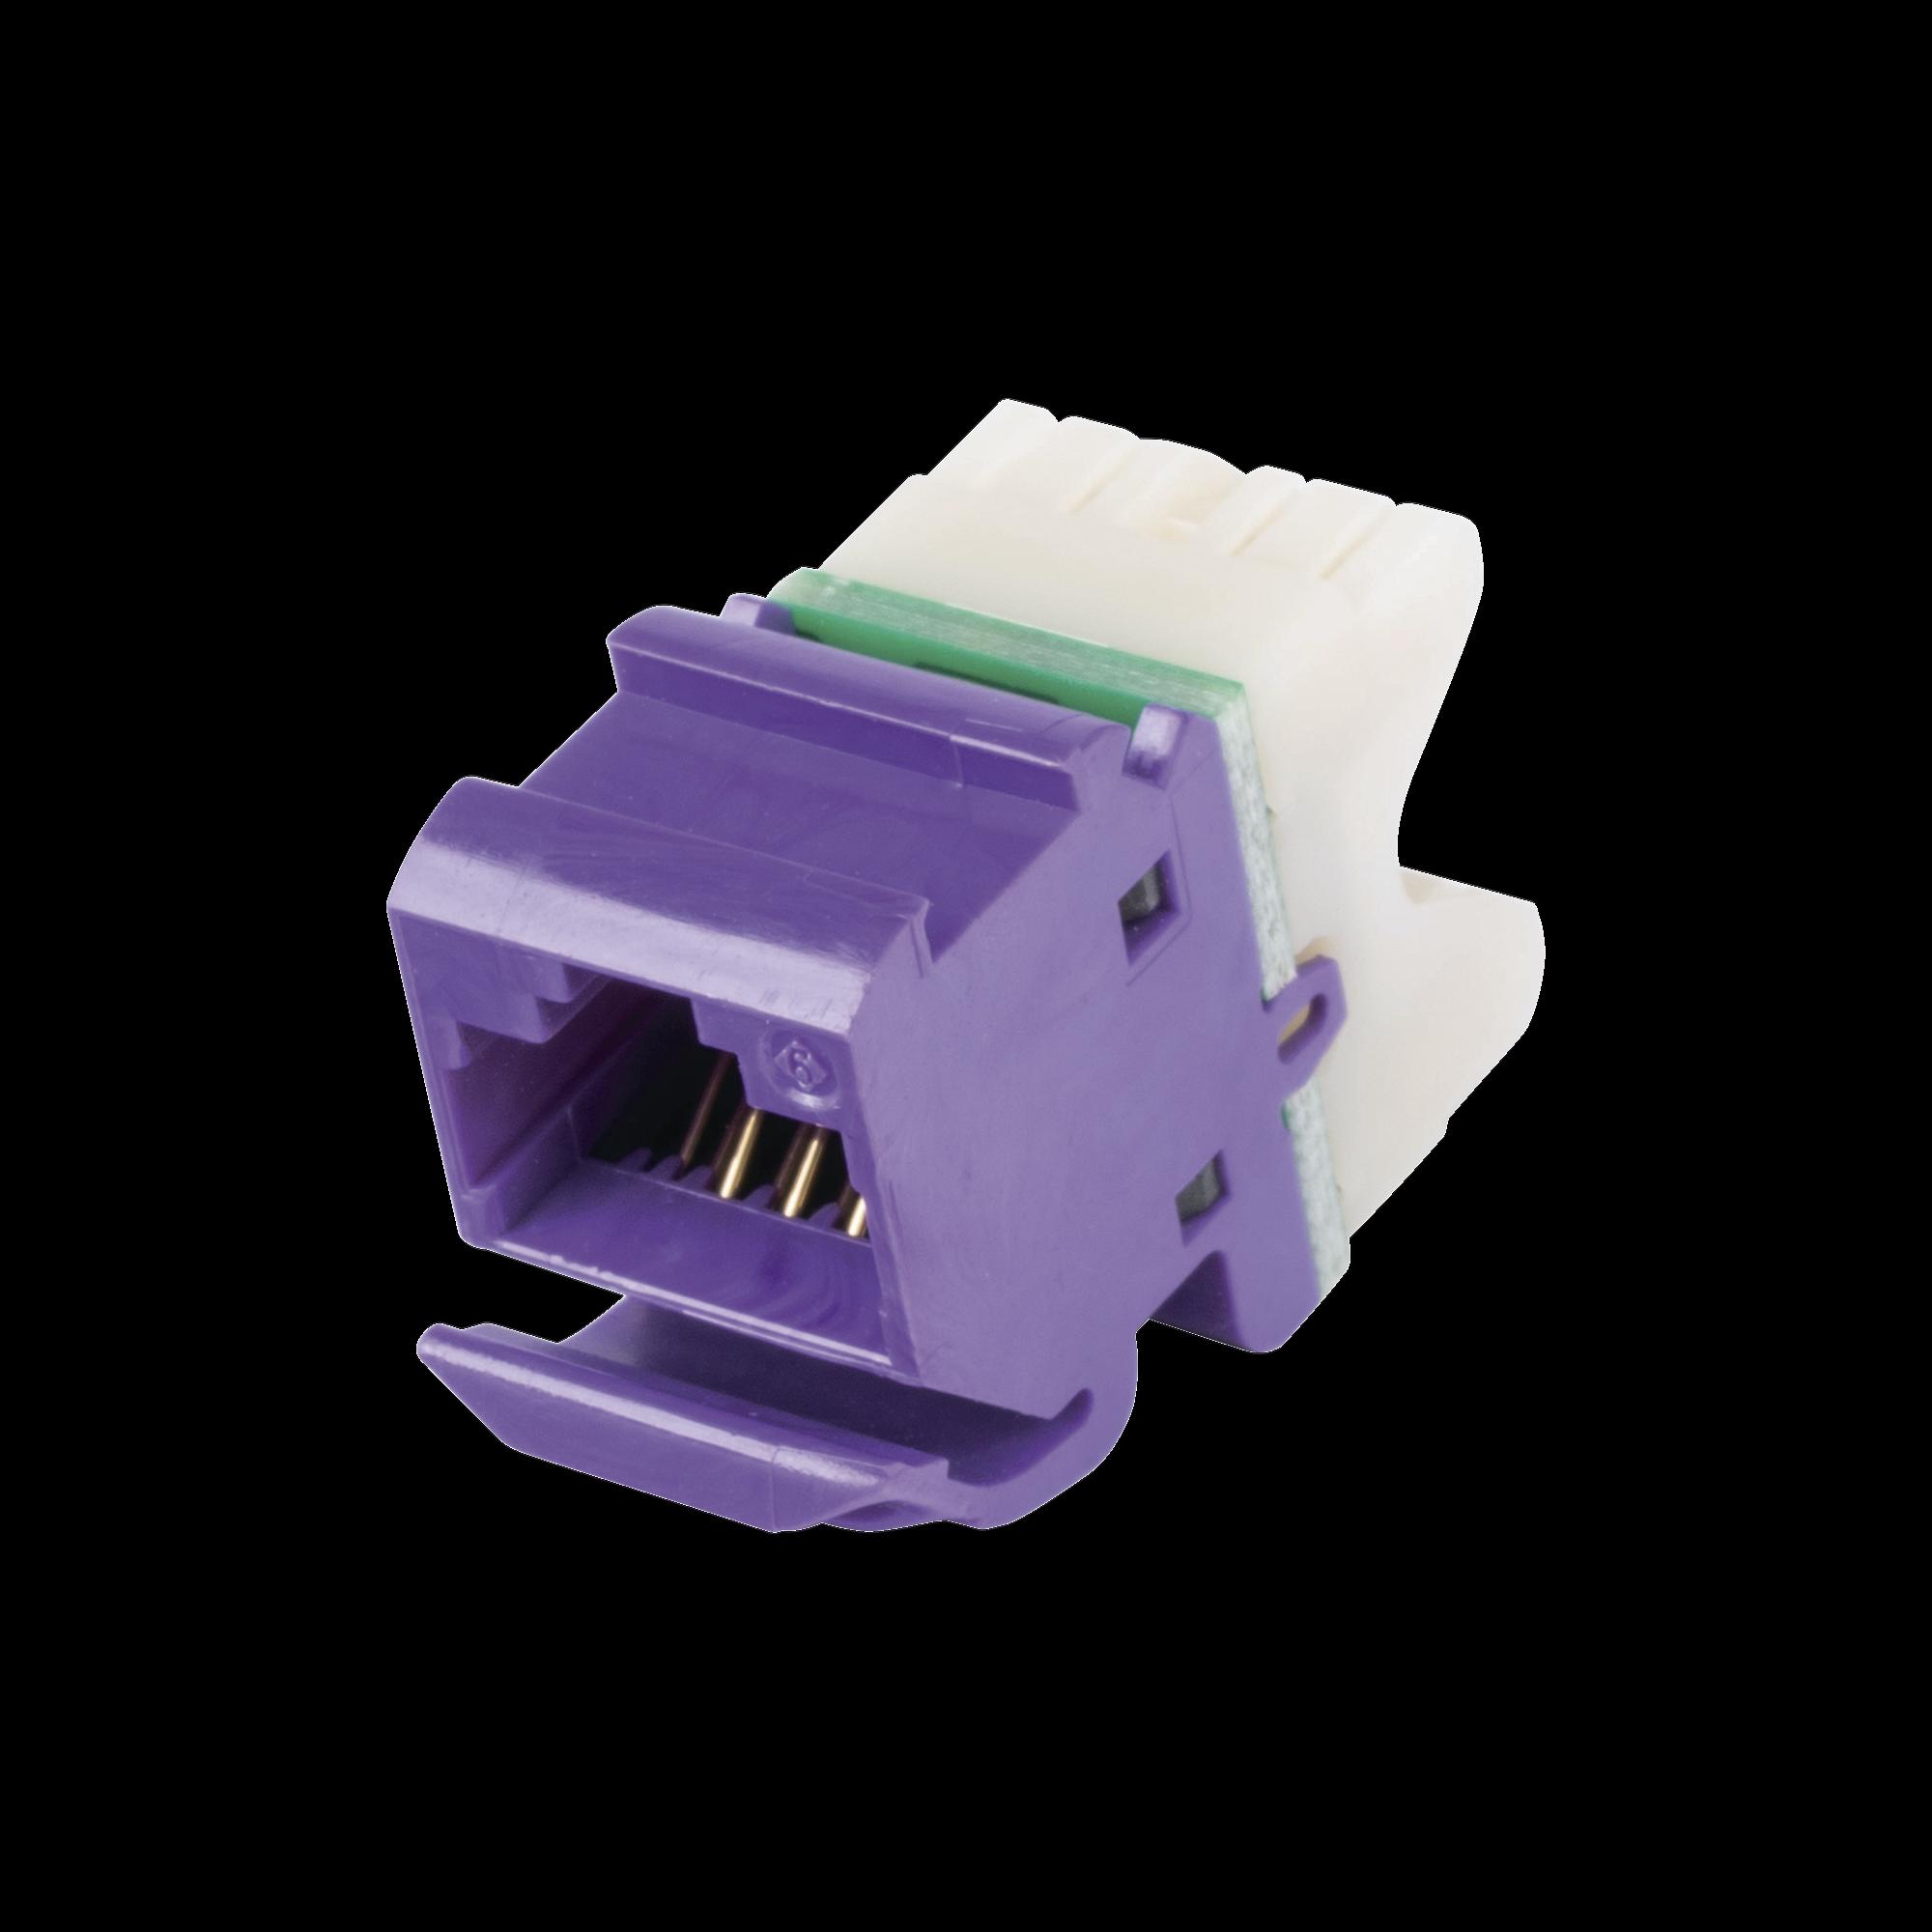 Jack MAX UTP Categoría 6, Estilo 110, Montaje Angulado, Color Violeta